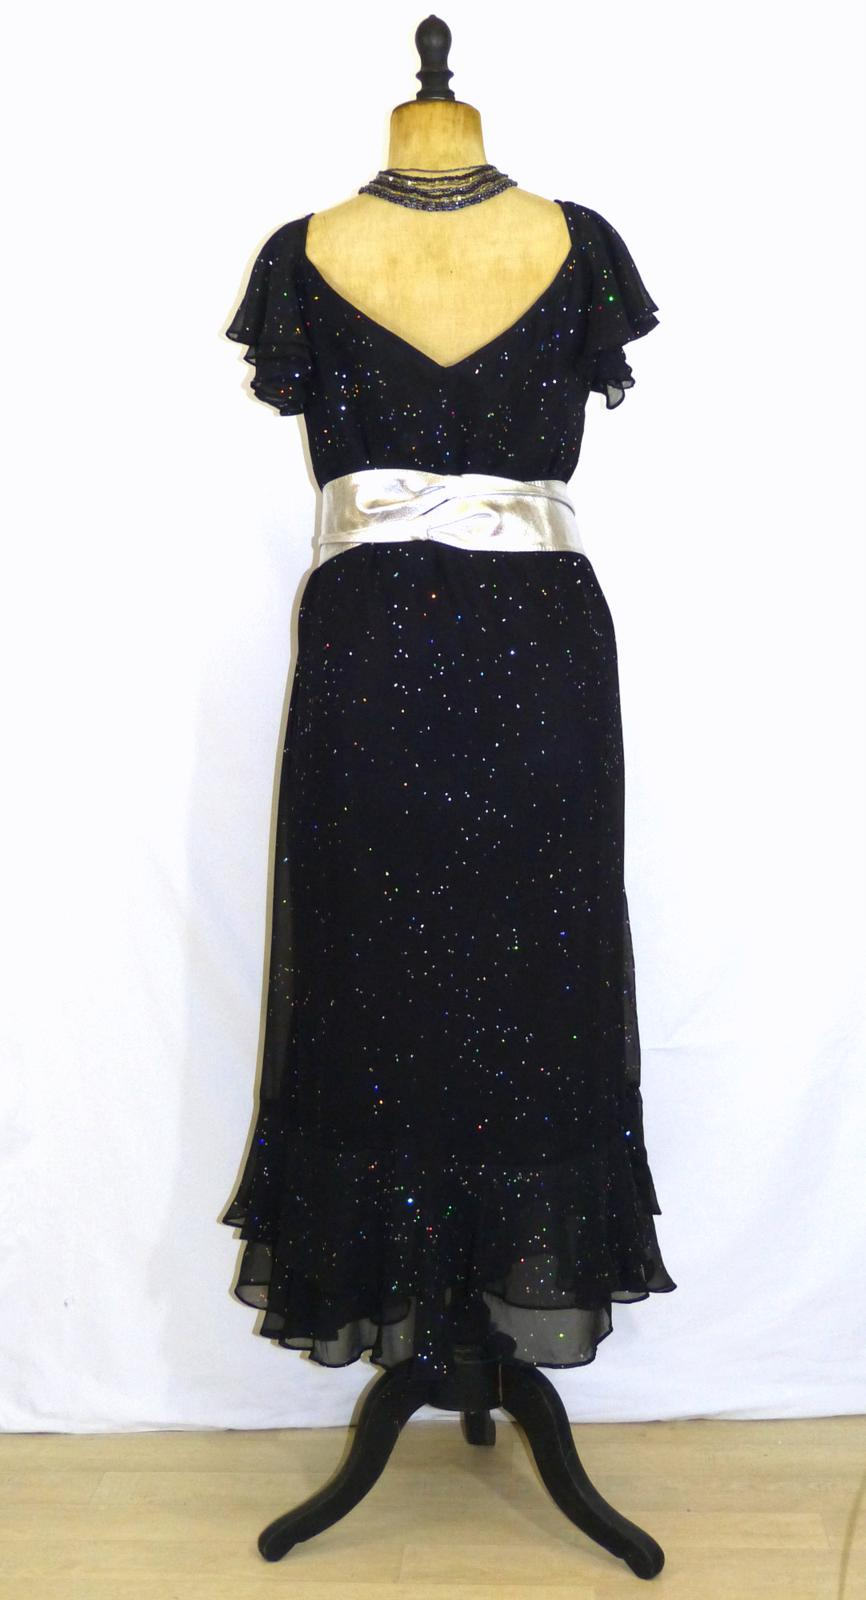 1335dbe0f76 Location robe grande taille NINA · location robe grande taille nina 01.  location robe grande taille ninia 02. location robe grande taille nina 02